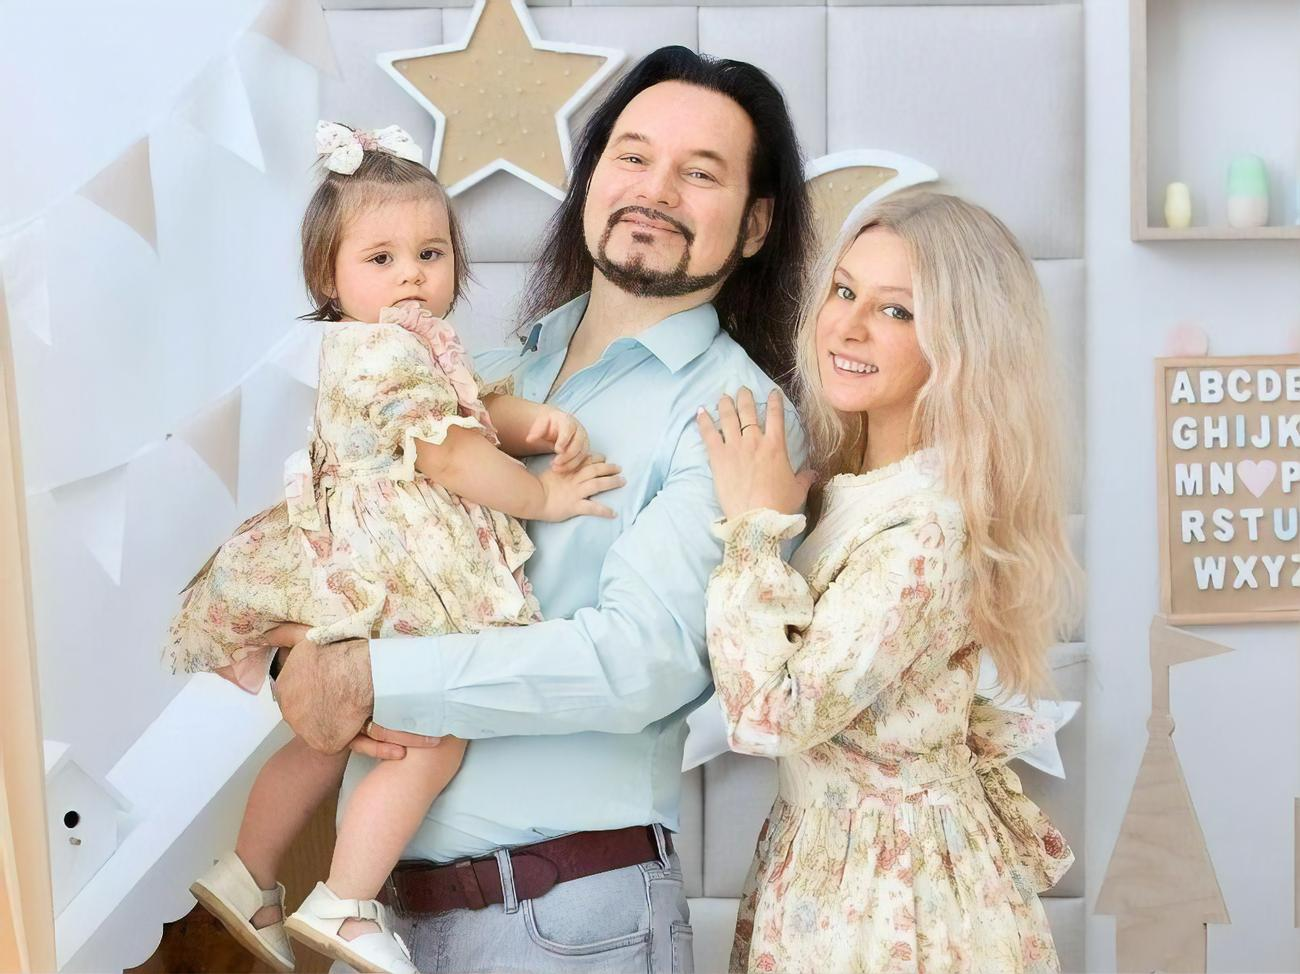 Вдова солиста «Хора Турецкого» Бориса Горячева родила дочь спустя три месяца после смерти мужа